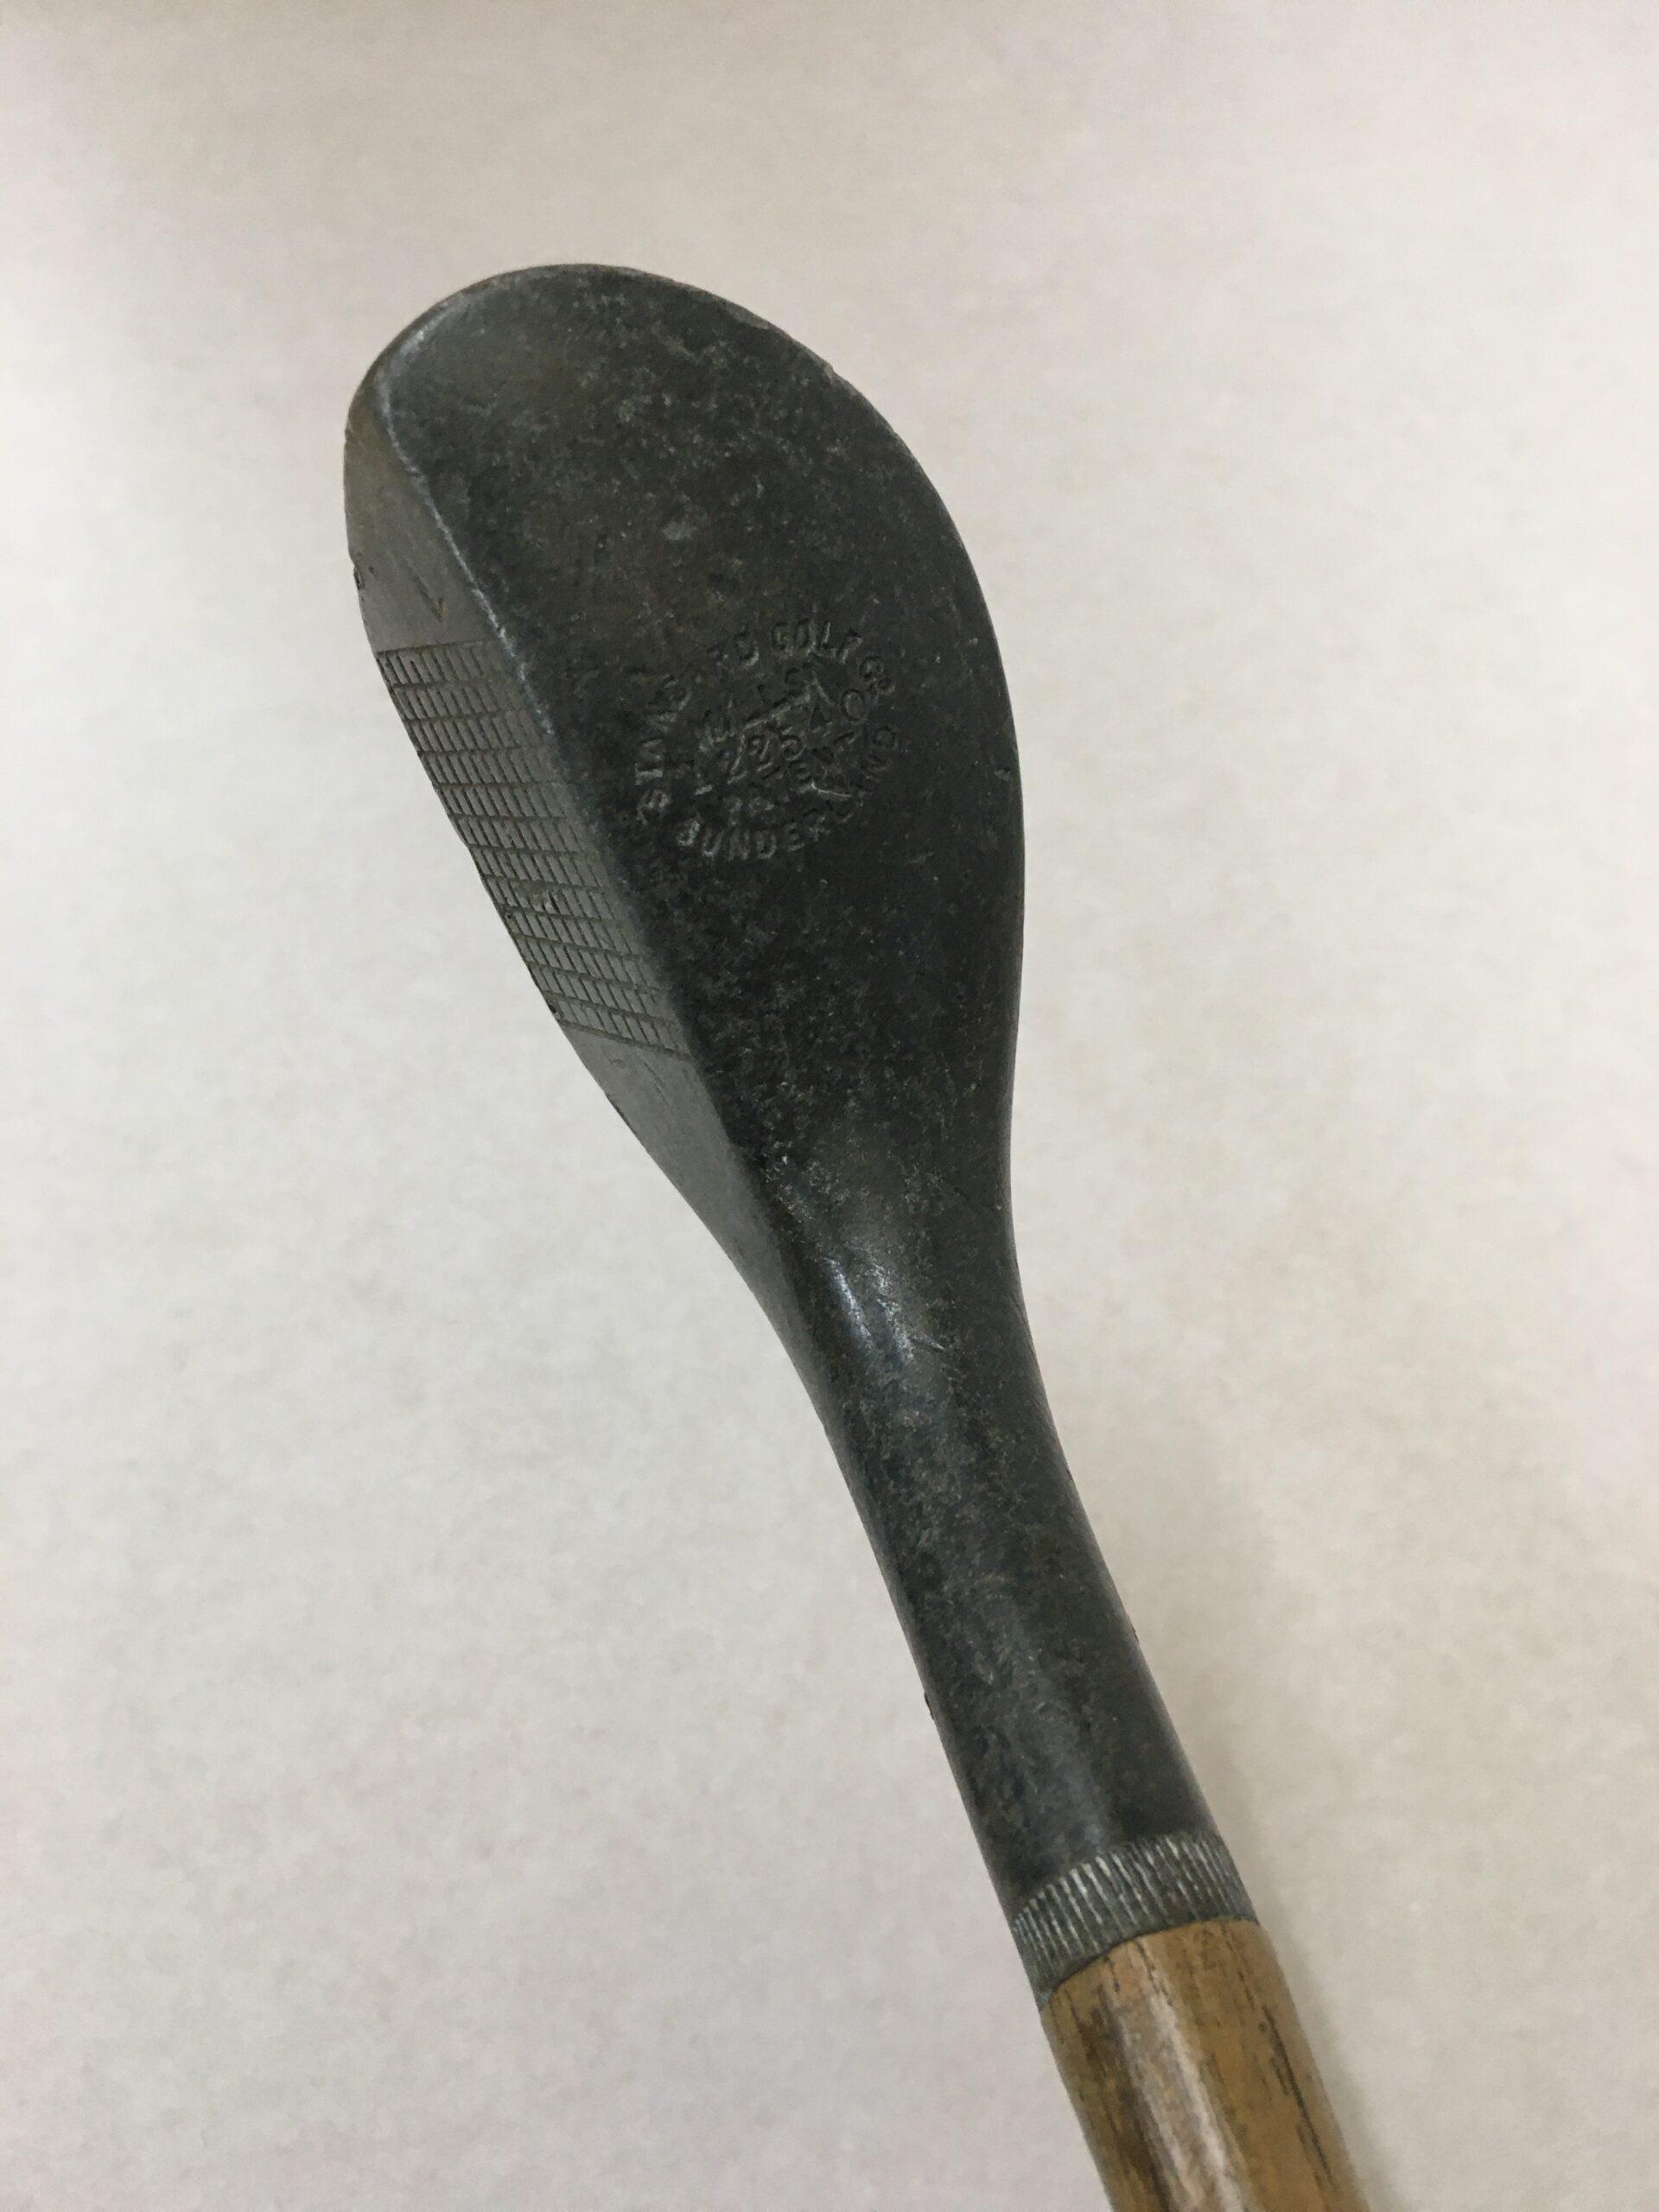 Standard Golf Co. MSD 1 1/2 Aluminium Fairway Wood